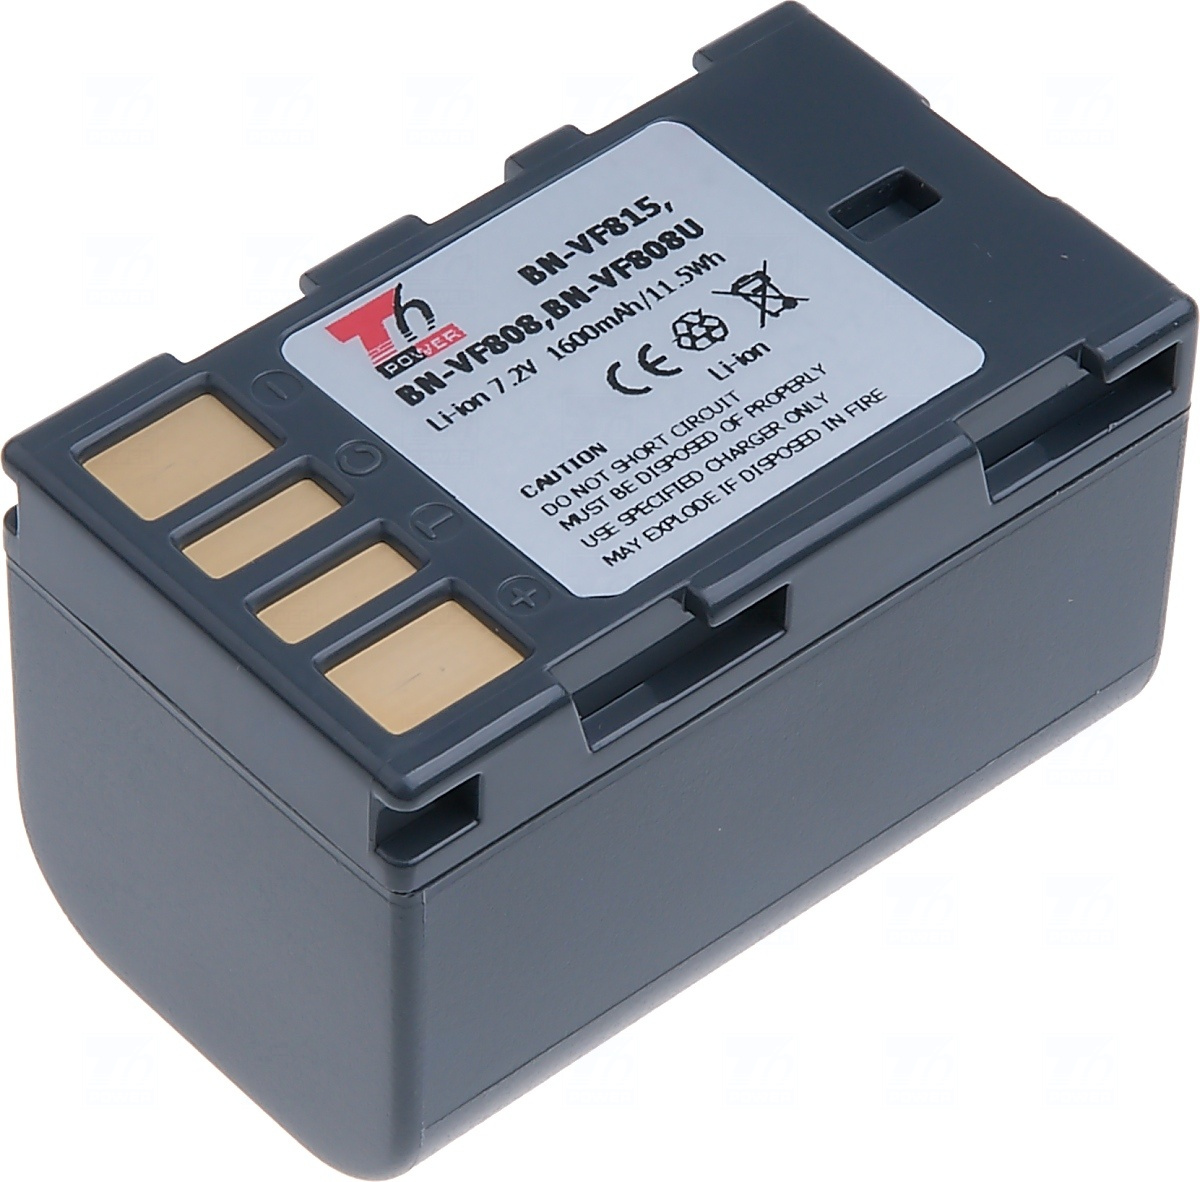 T6 power Baterie T6 power JVC BN-VF808, BN-VF808U, BN-VF815, BN-